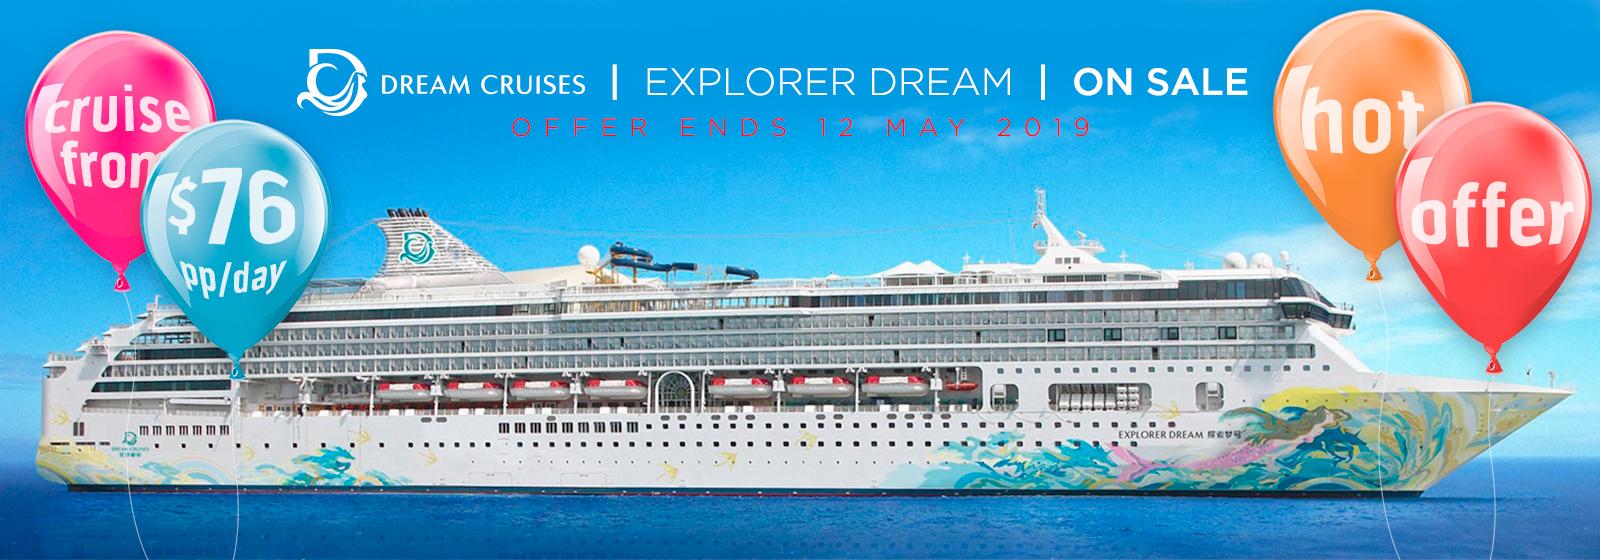 Explorer Dream